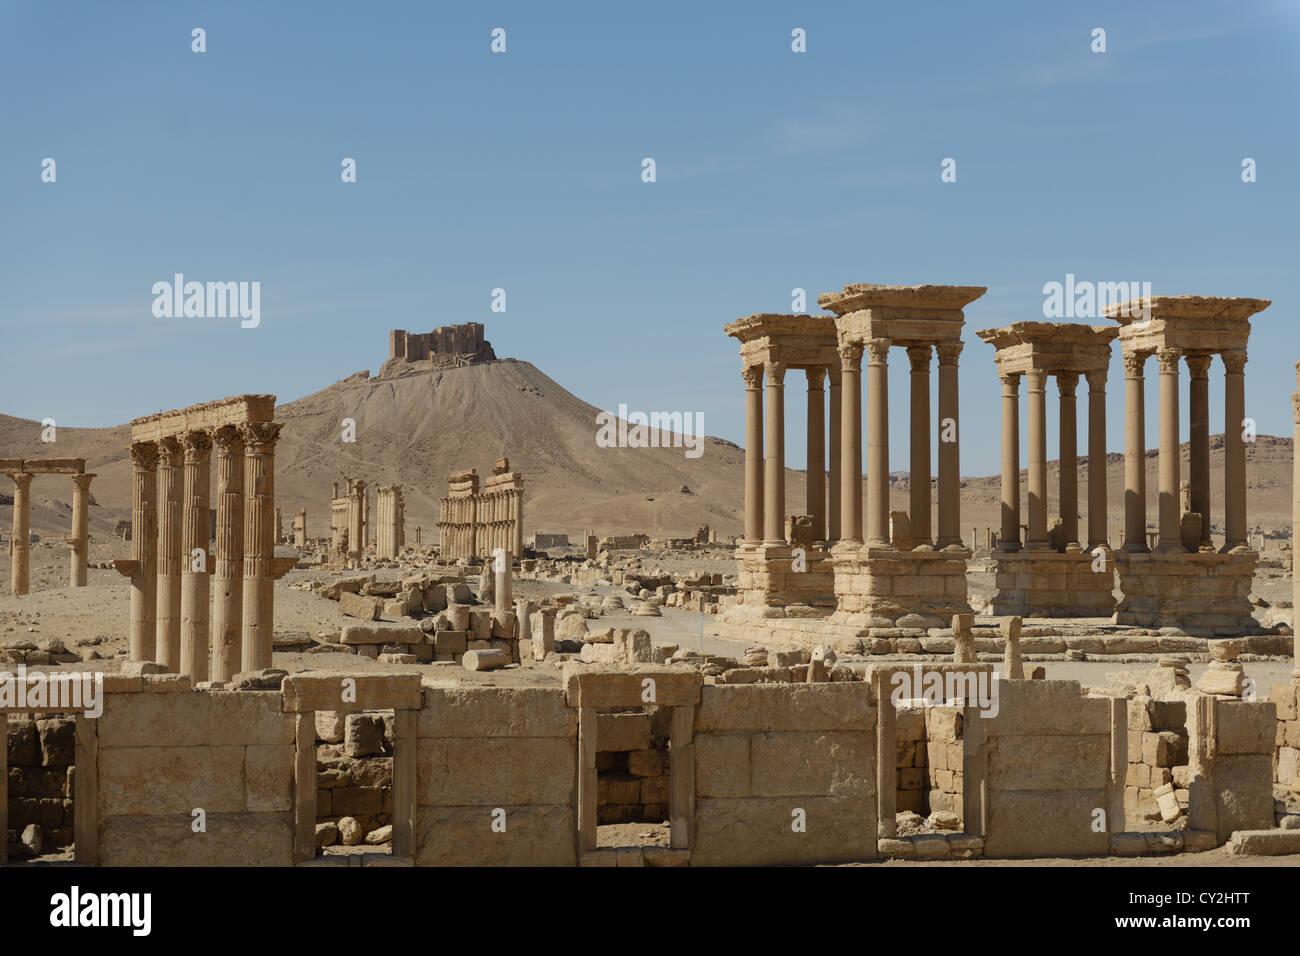 Ancient Ruins of Palmyra, Syria - Stock Image